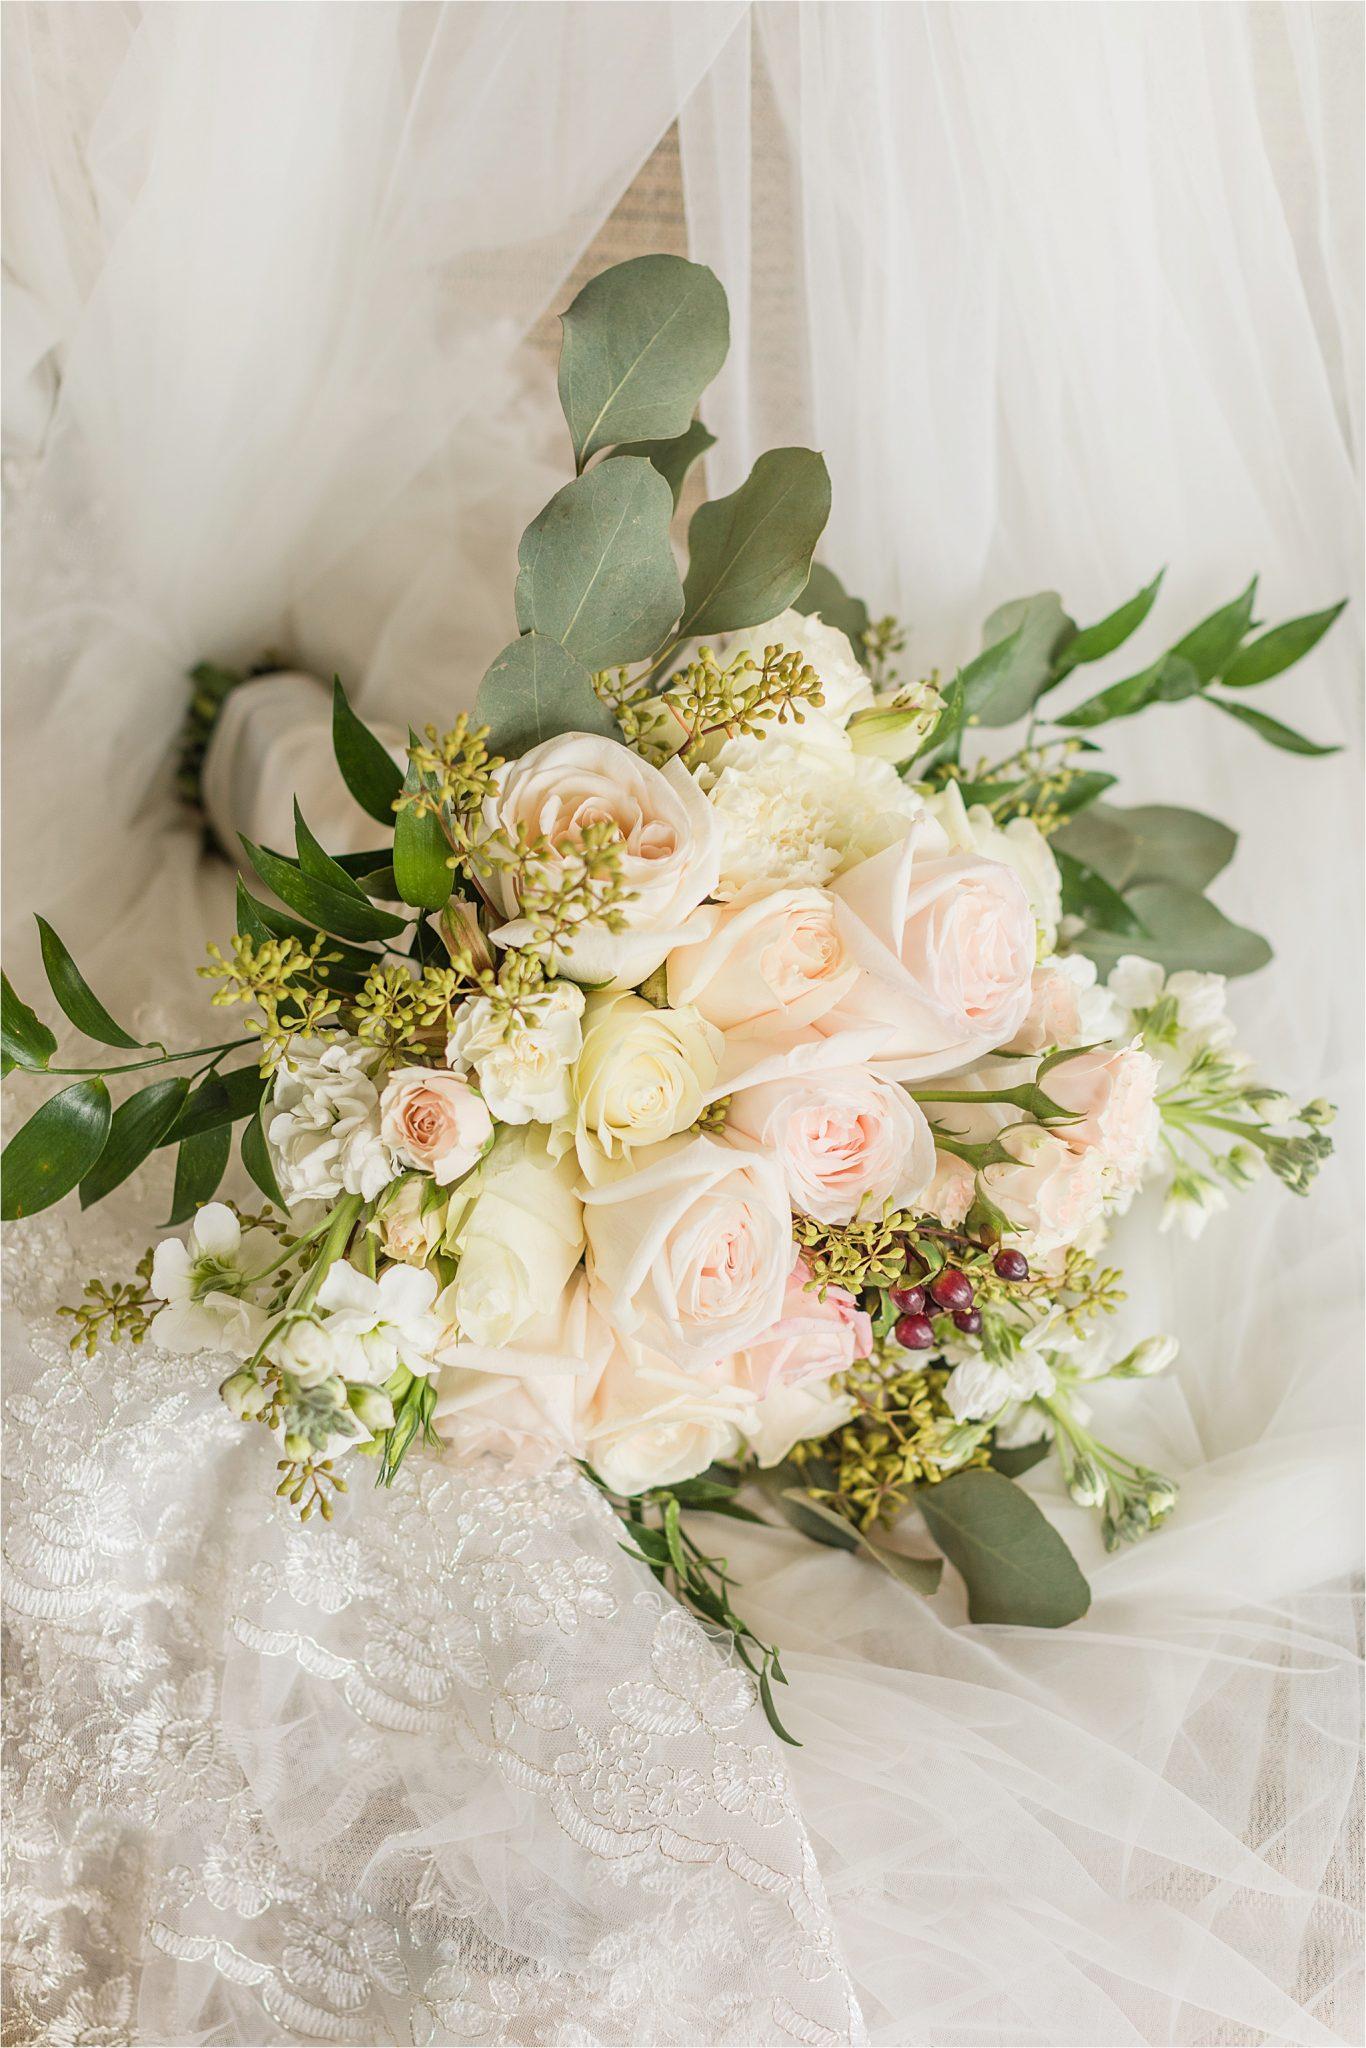 Wedding details-bouquet-Wedding florals-white-pink-roses